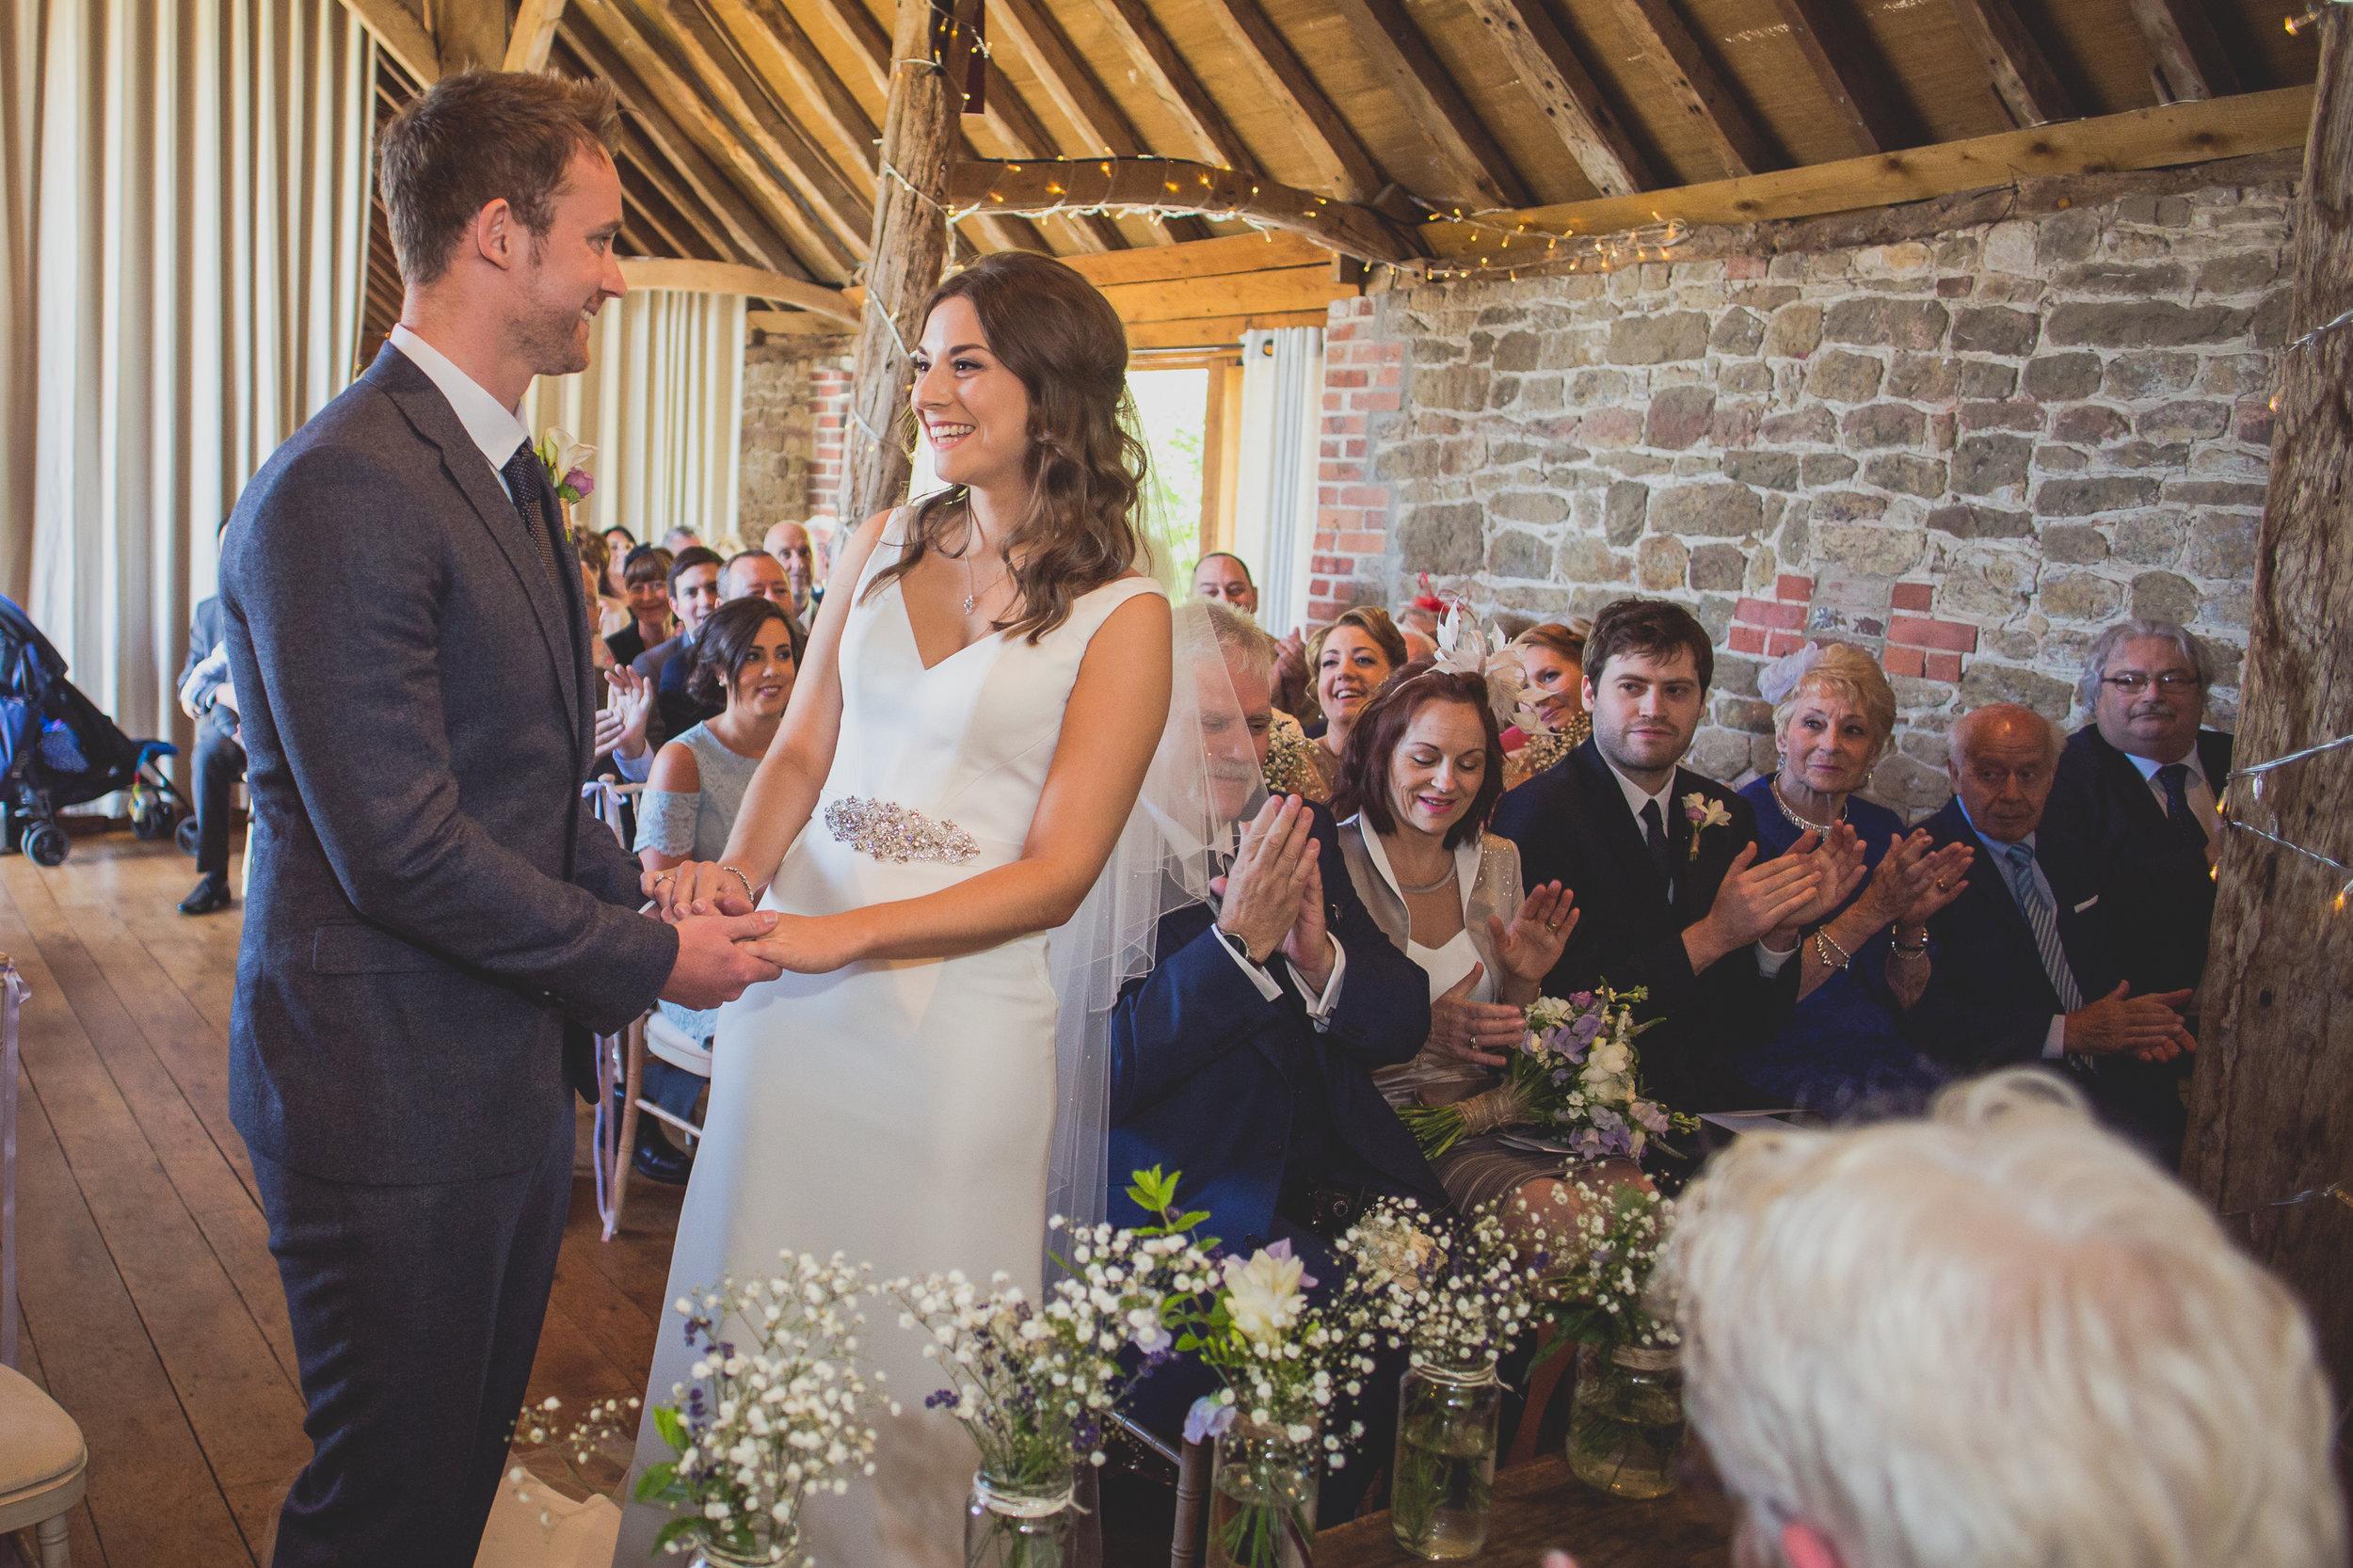 Grittenham Barn female wedding photographers west sussex petworth social-62.jpg